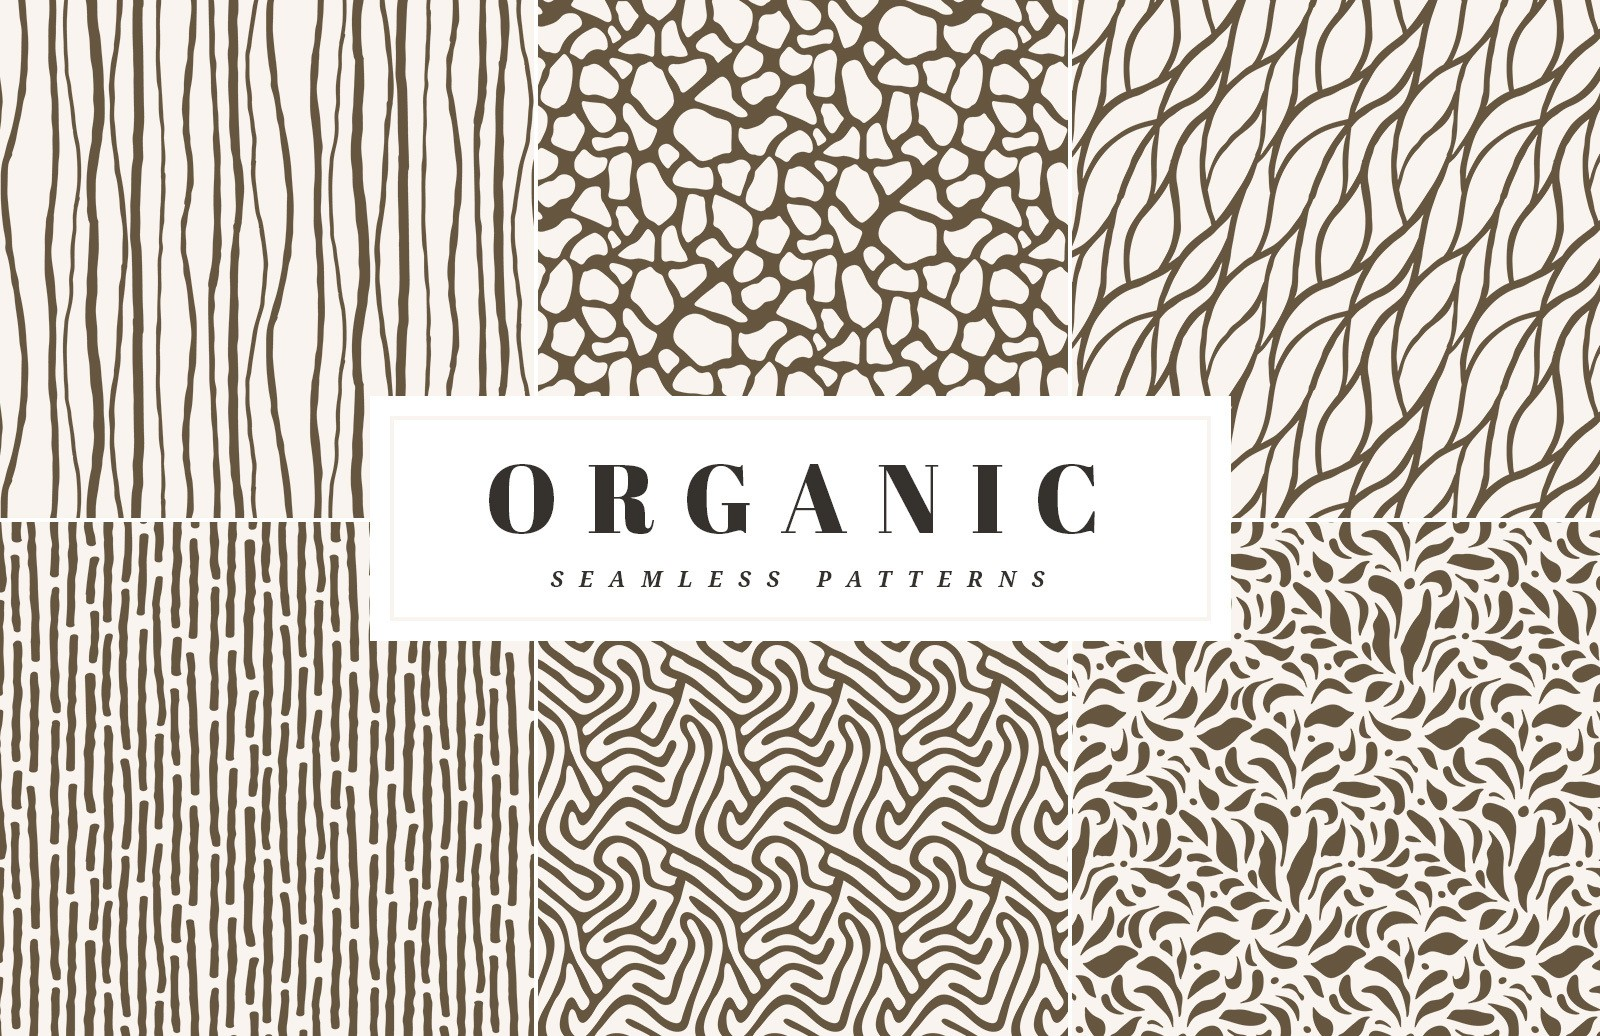 Free Organic Seamless Vector Patterns